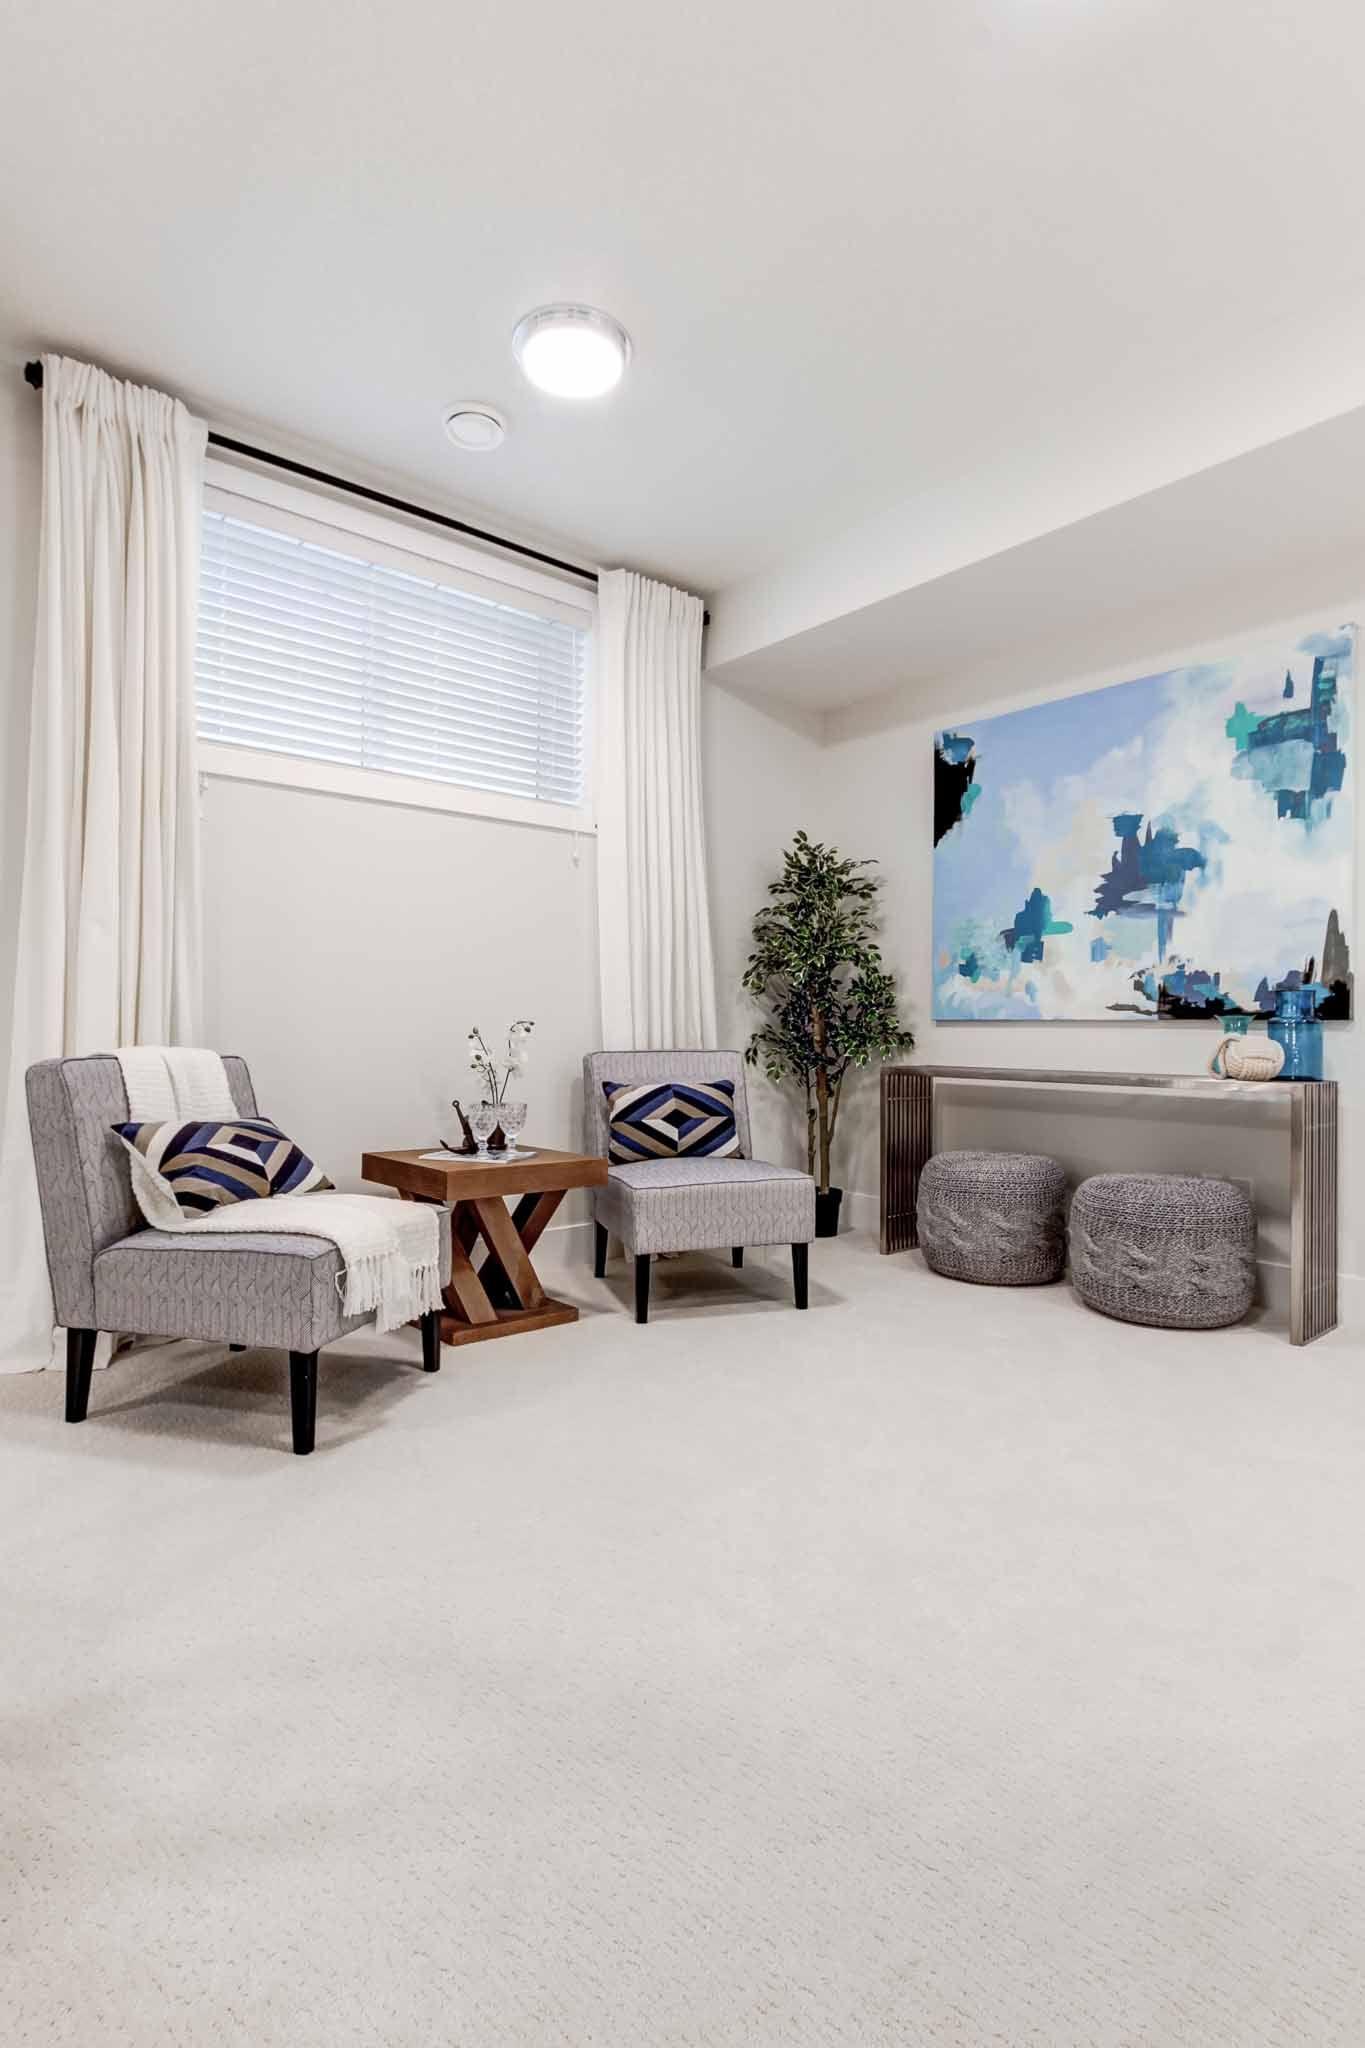 Show Home In Cornerstone Calgary Built By Truman Yyc Homedecor Newhome Interior Design Home Decor Interior